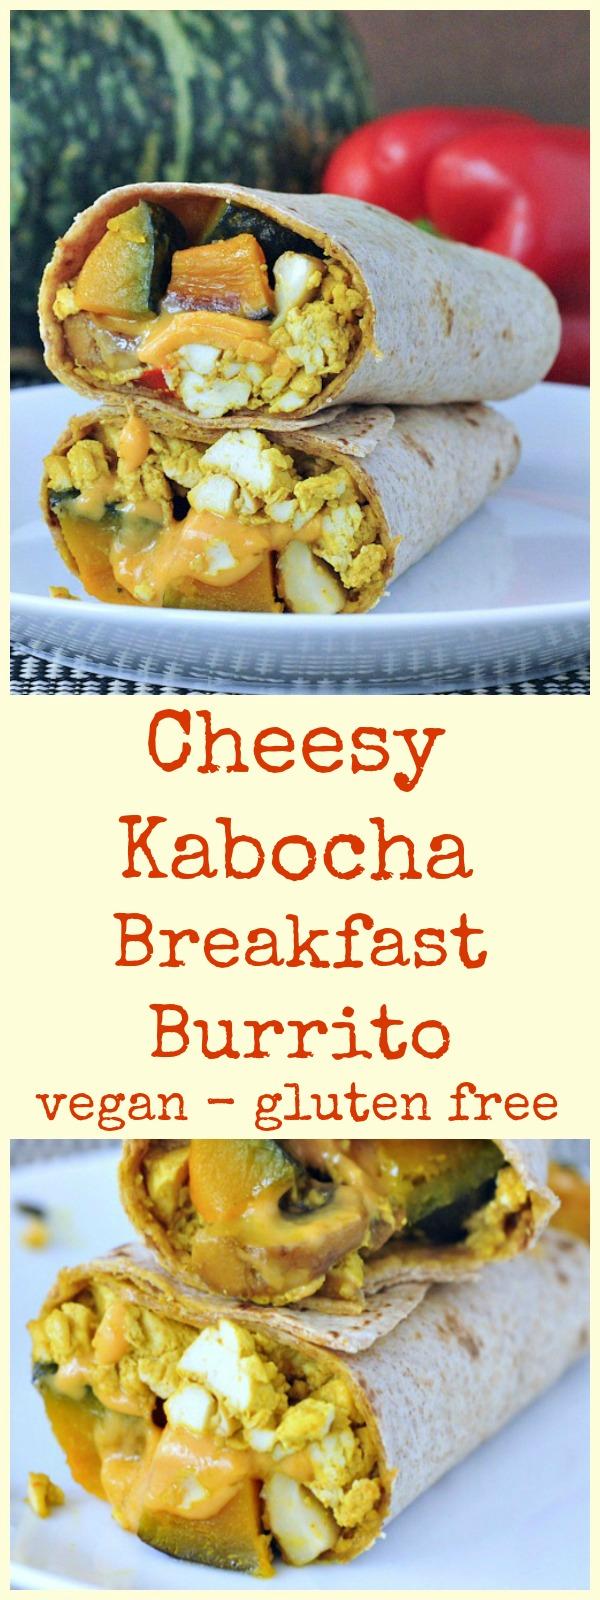 Cheesy Kabocha Breakfast Burrito @spabettie #vegan #glutenfree